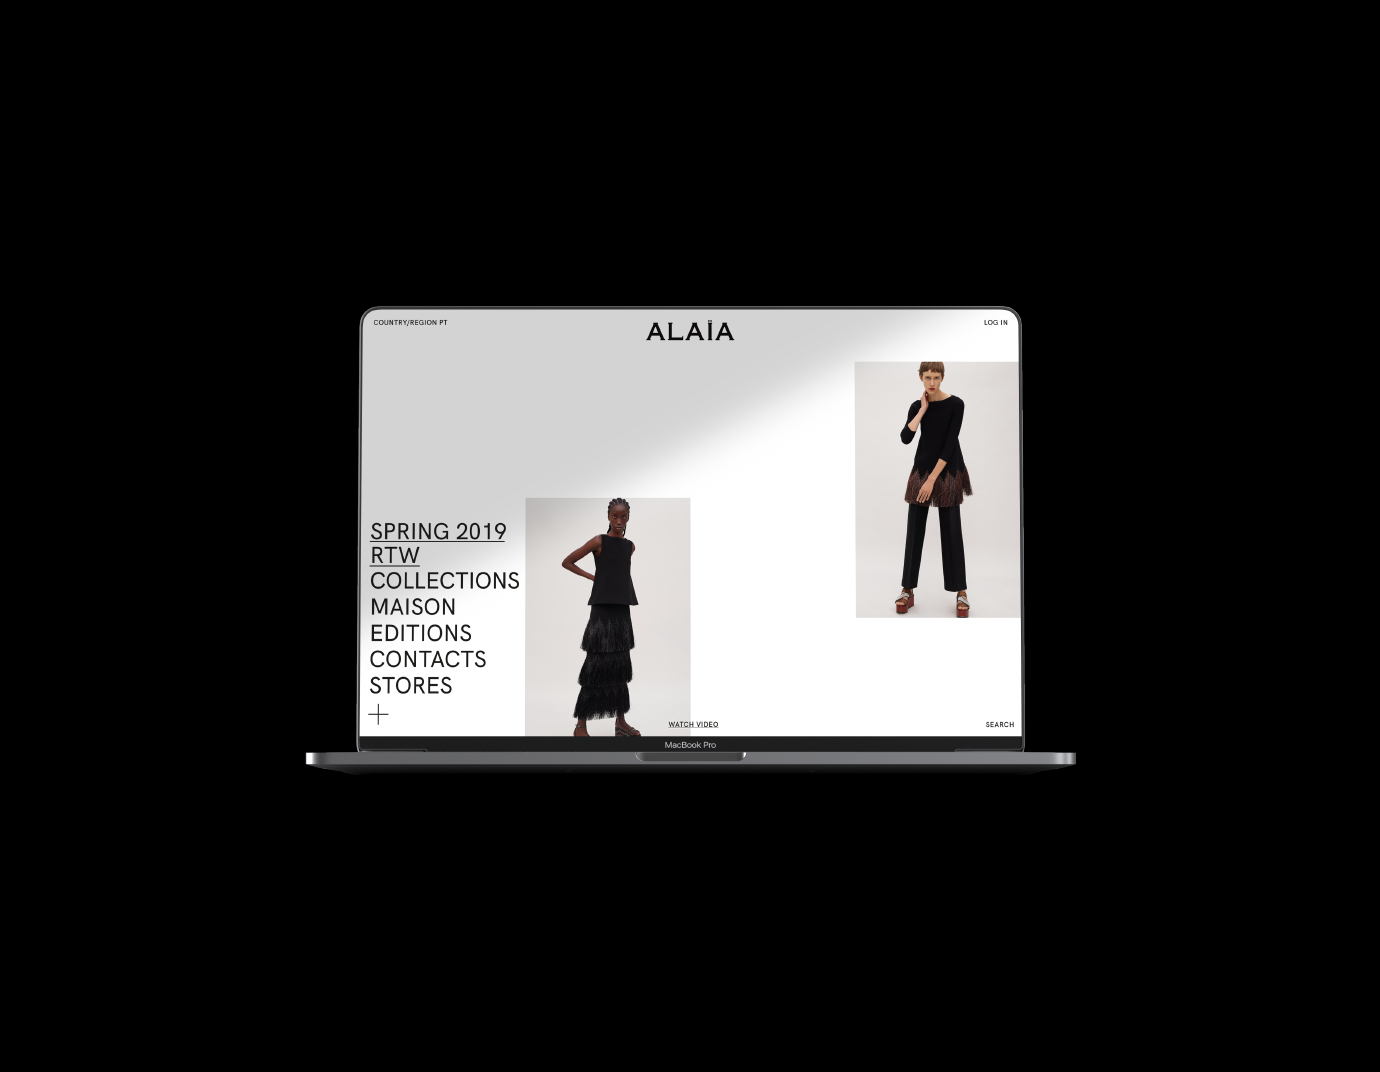 alaia_project_mac_1